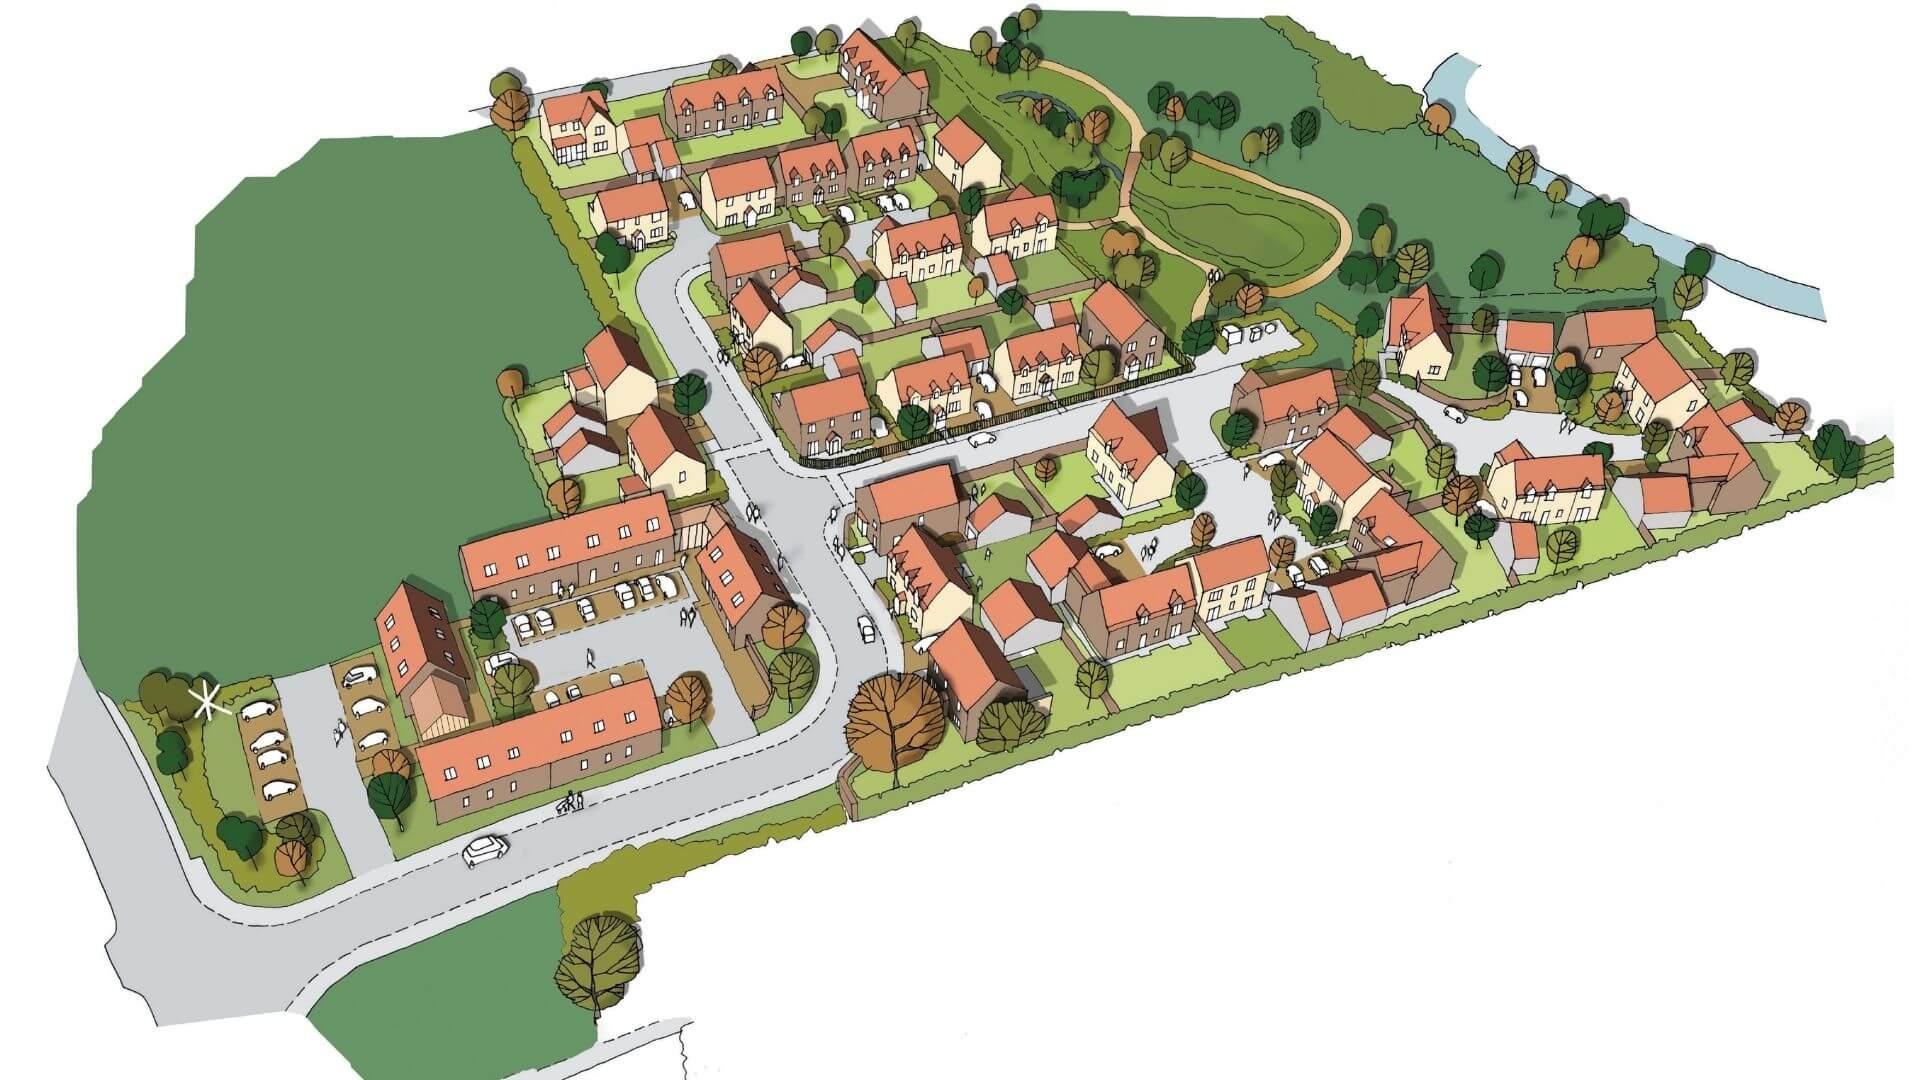 3D view of the zero carbon housing development plan in Tickenham